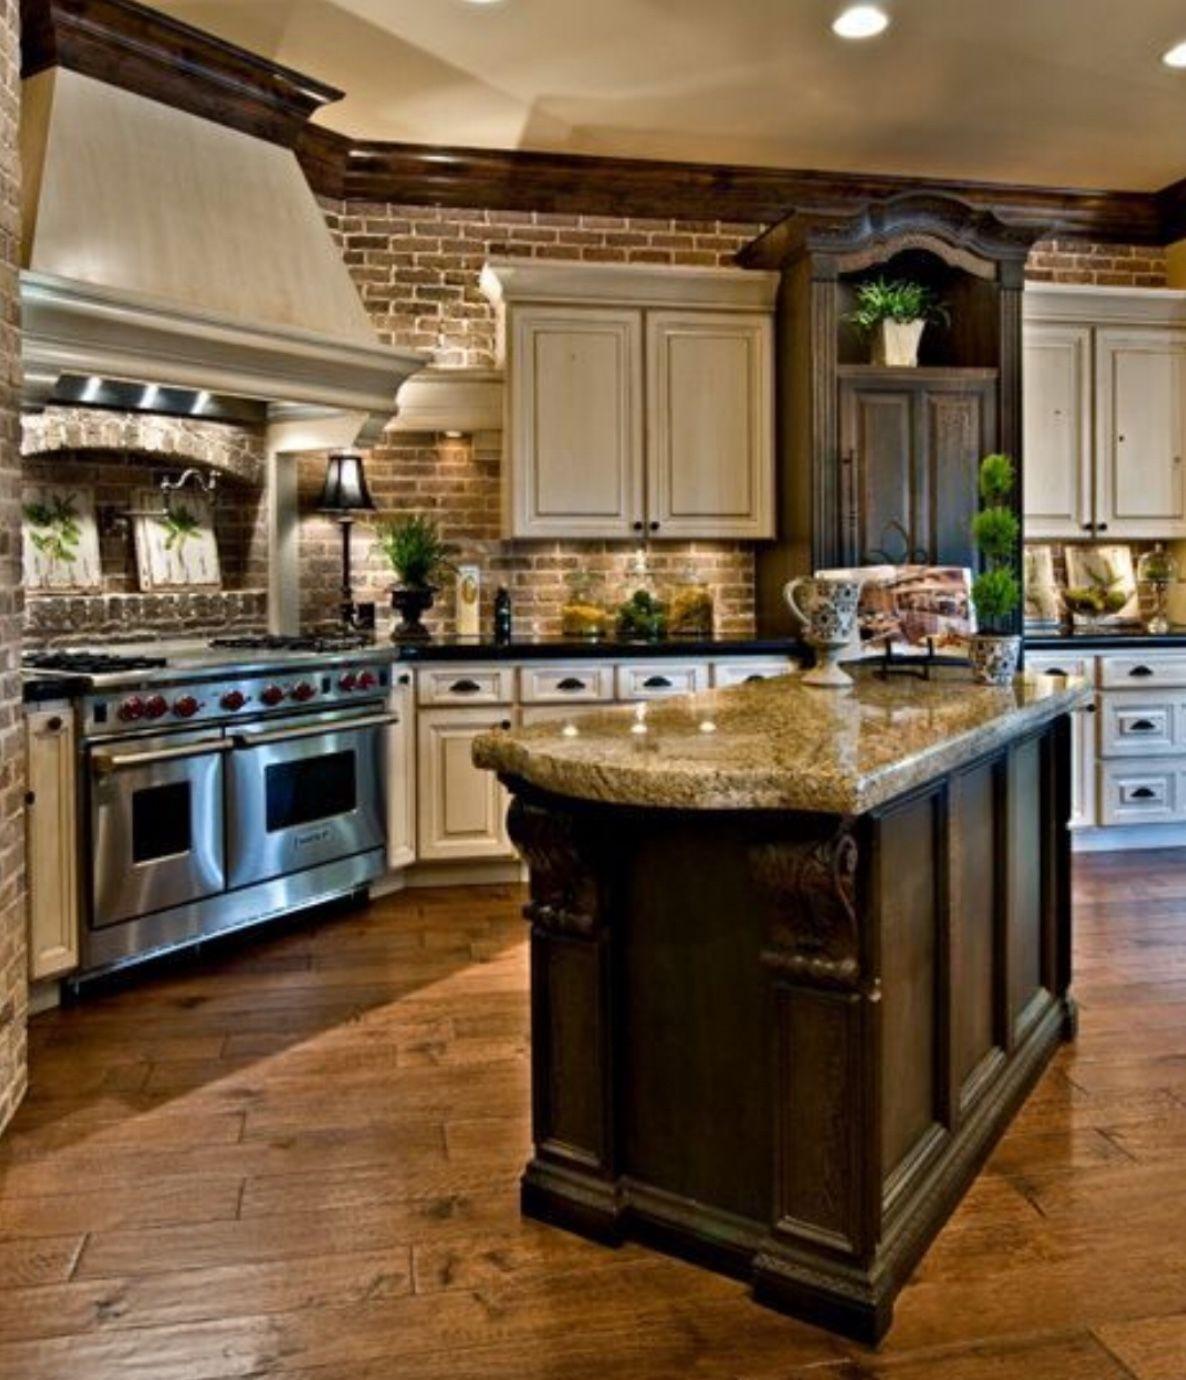 brick backsplash kitchens in 2019 kitchen design kitchen backsplash farmhouse style kitchen on outdoor kitchen backsplash id=27545